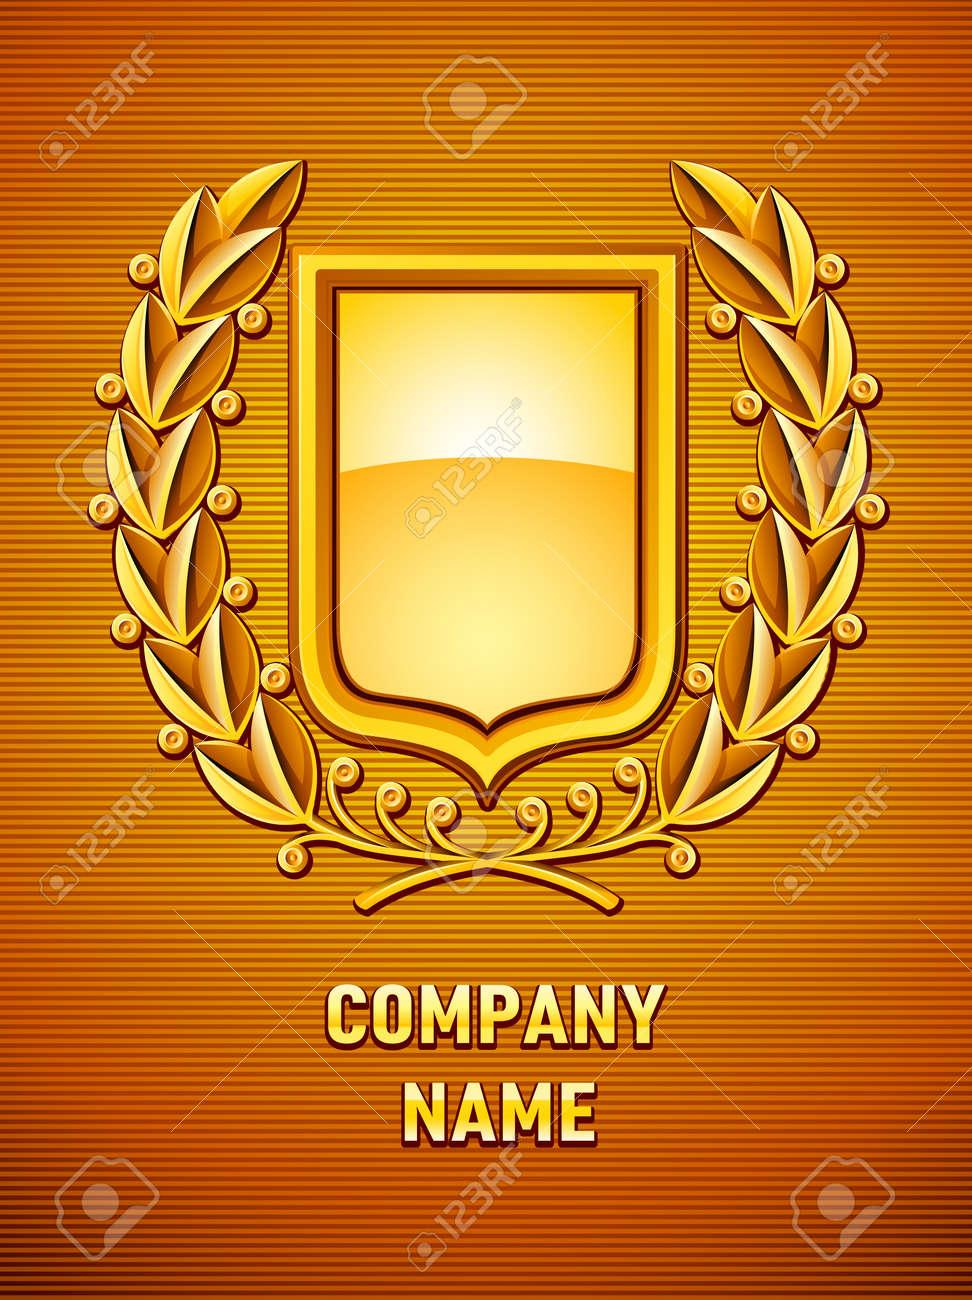 heraldic emblem with gold laurel wreath. vector illustration Stock Vector - 8621475